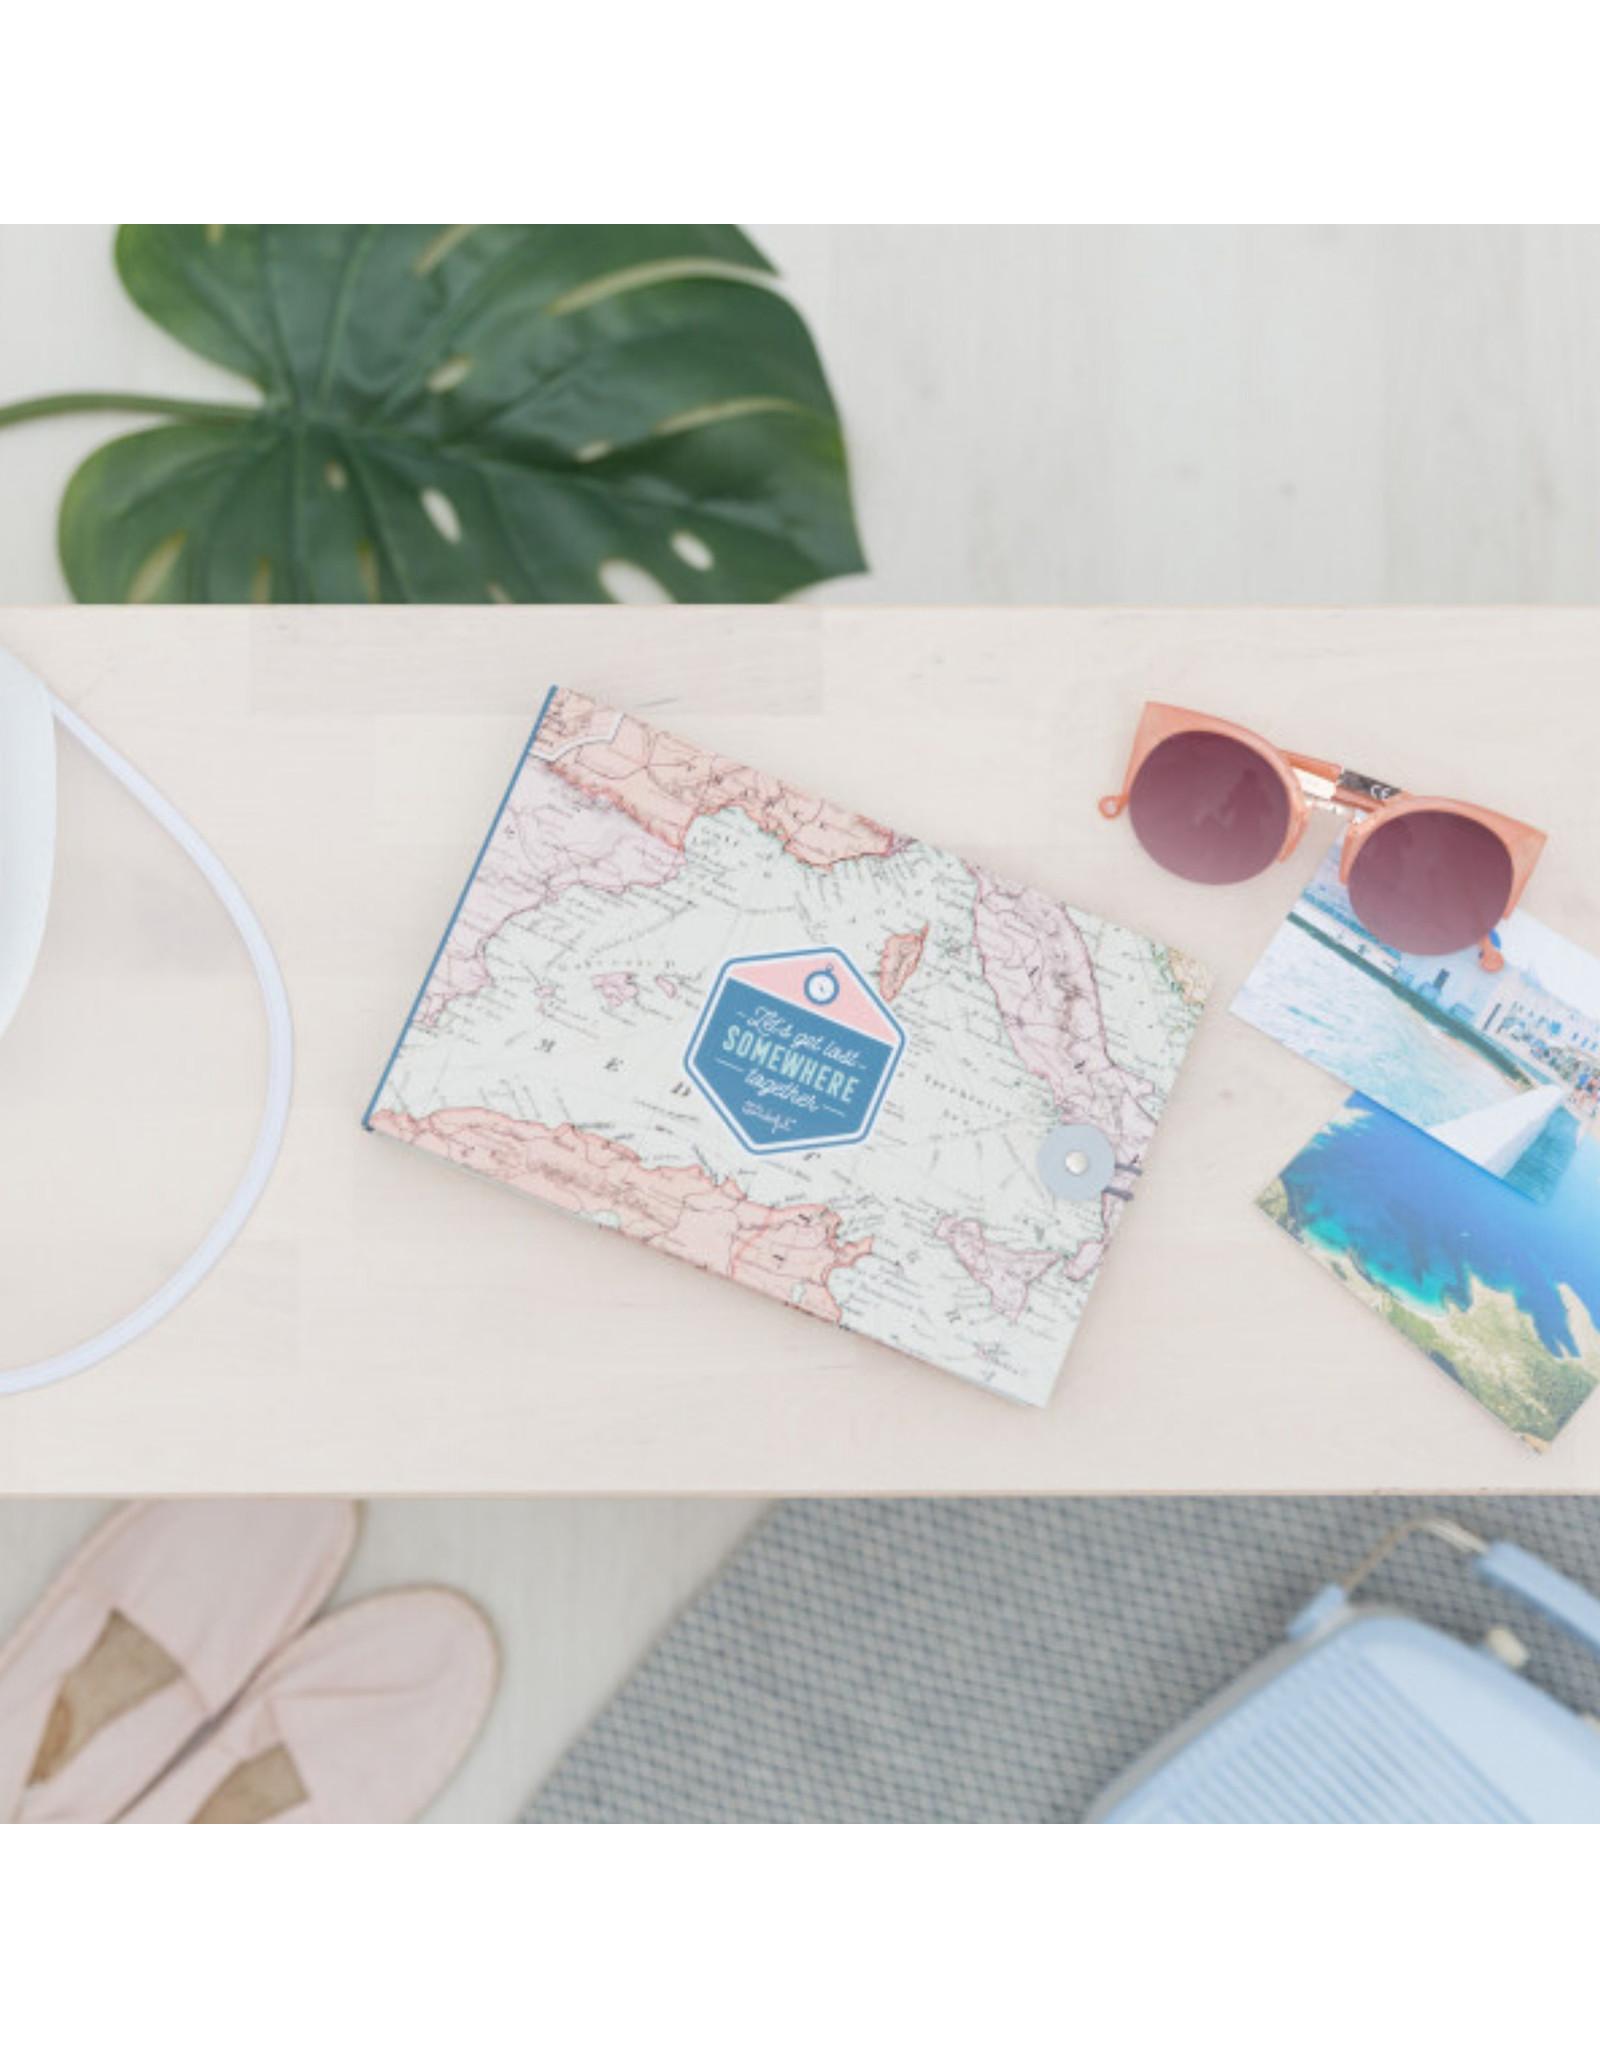 Mr Wonderful Fotoalbum - Let's get Lost Somewhere